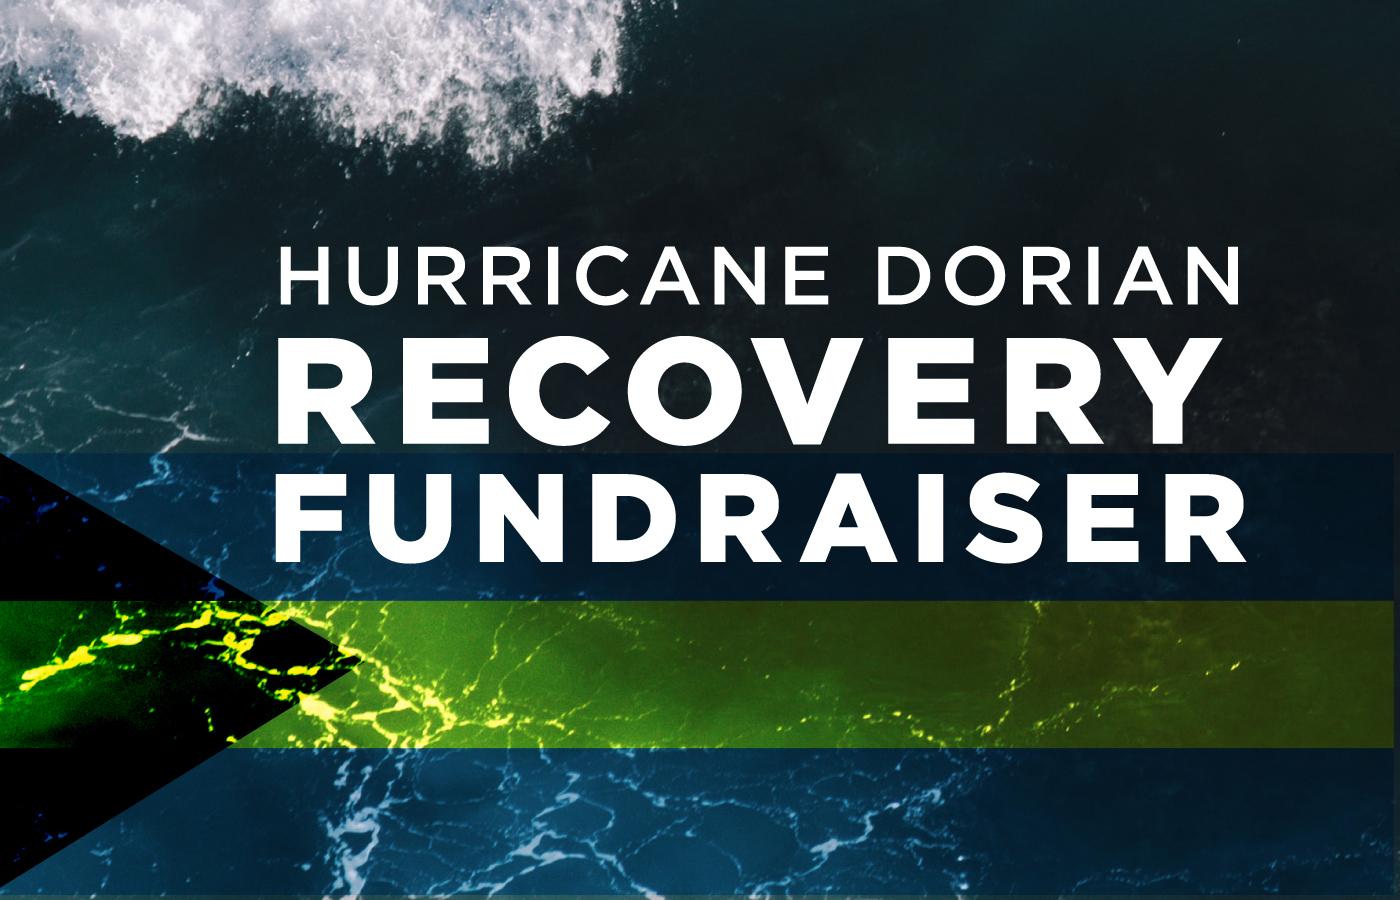 Hurricane Dorian Fundraiser [Bahamas Relief]